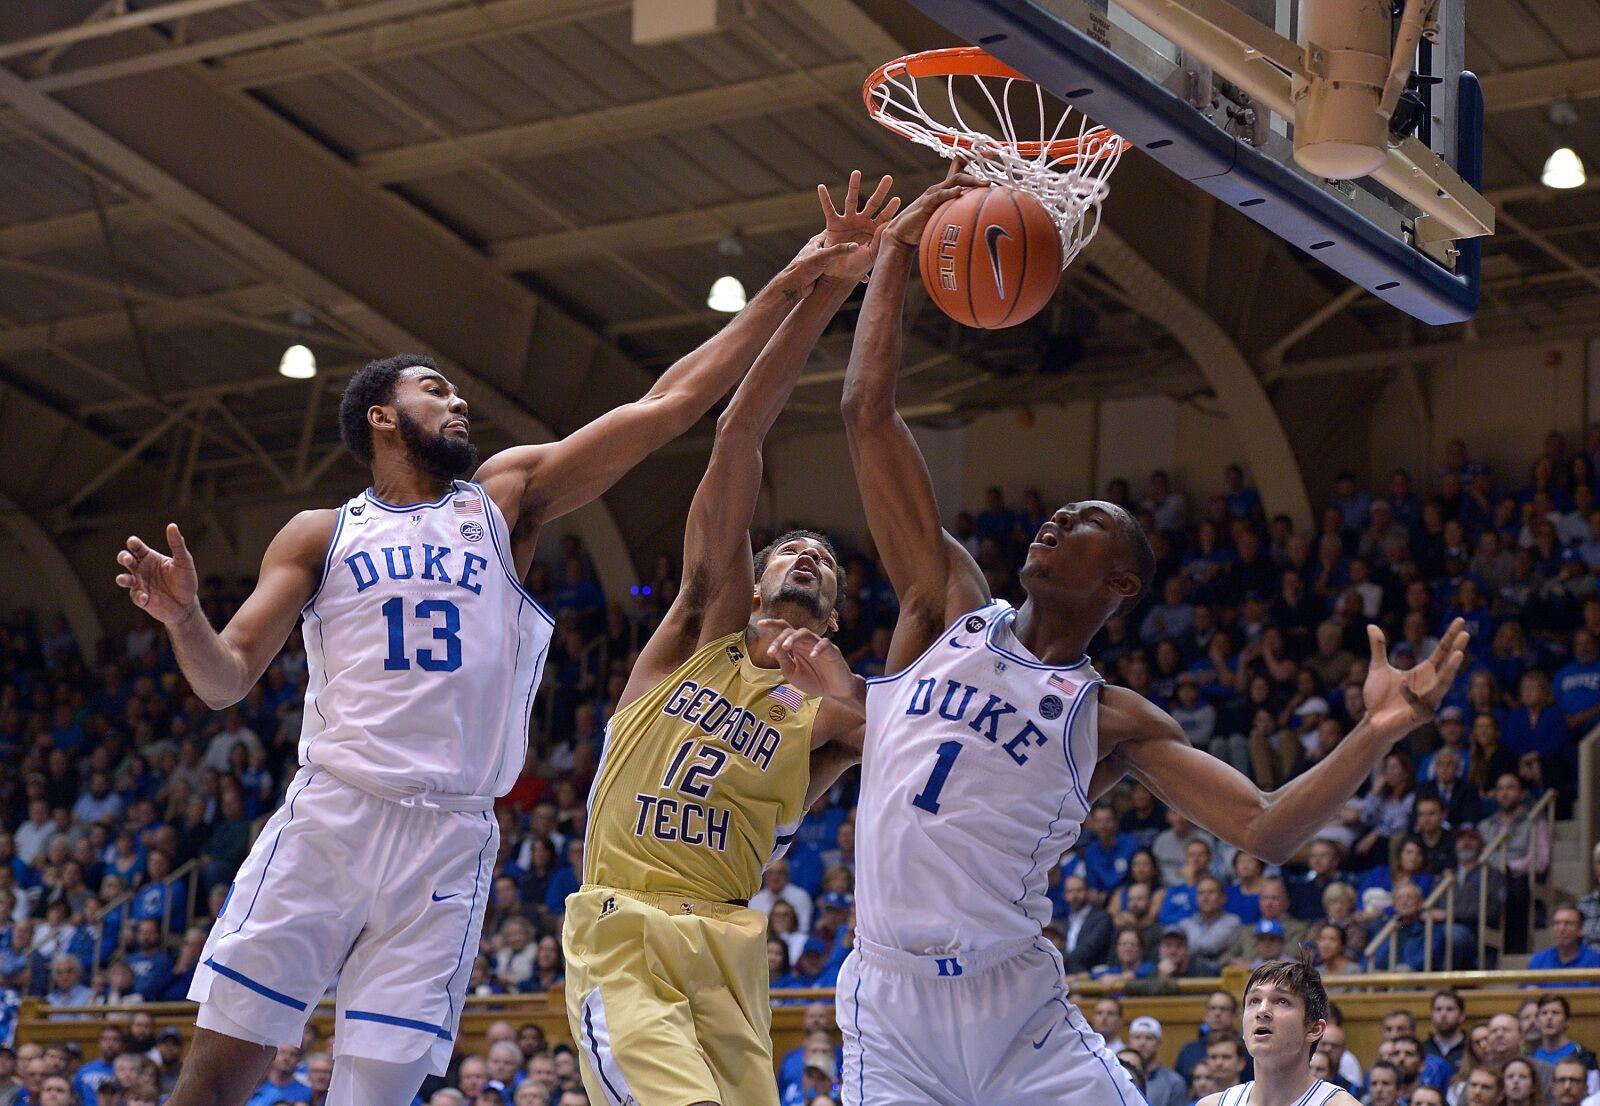 37e04122b47 Duke in the NBA: Giles Stars as Lone Duke Big in Kings Frontcourt